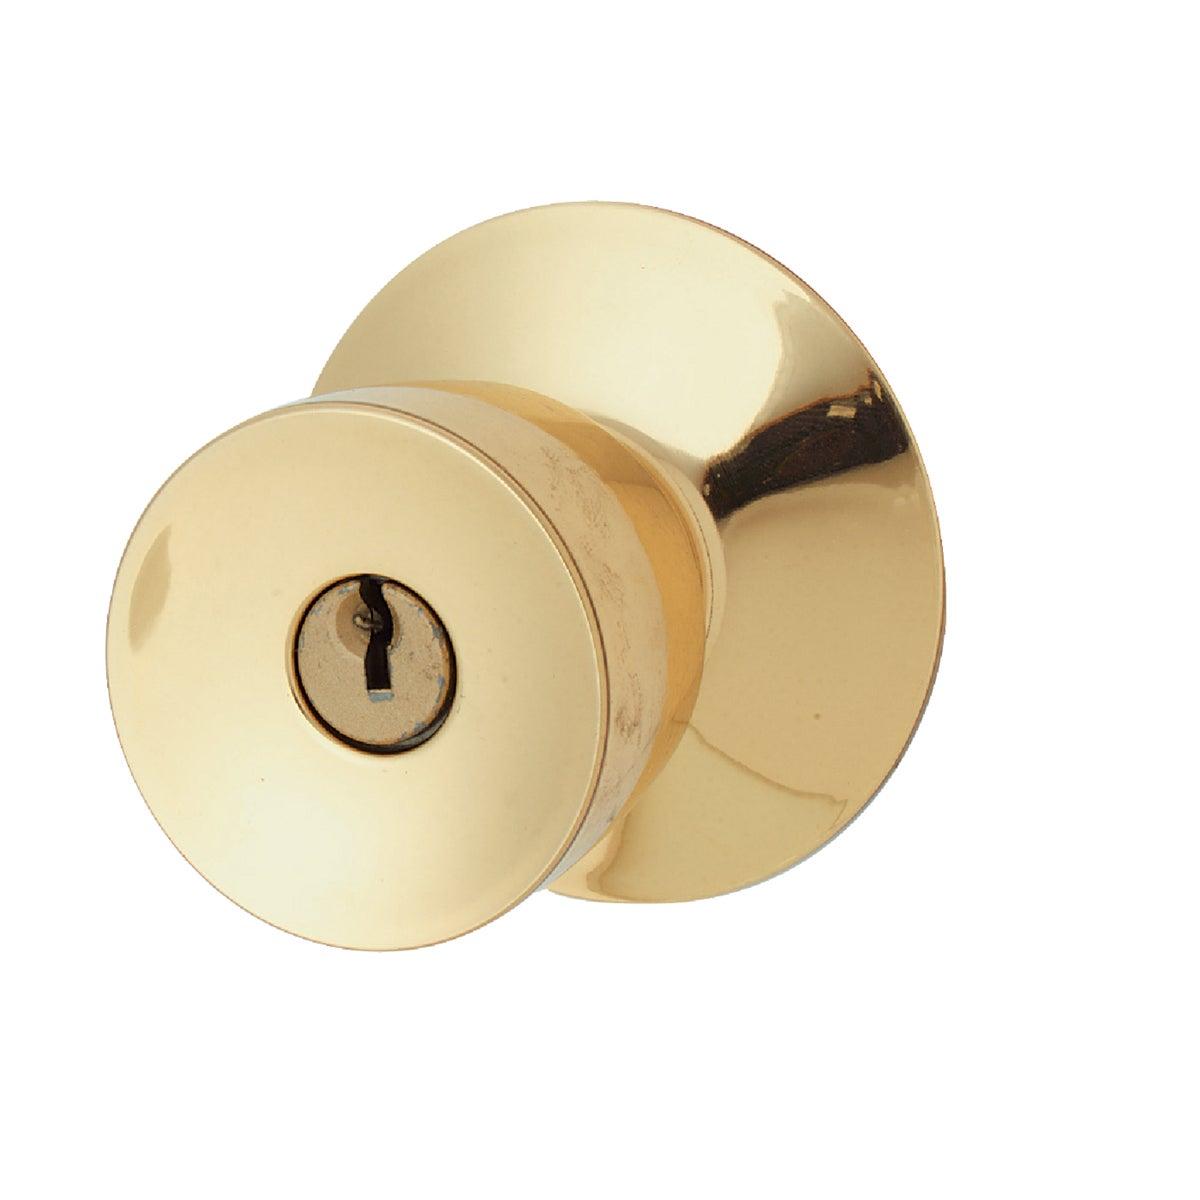 PB BELL ENTRY LOCKSET BX - F51ABEL605 by Schlage Lock Co